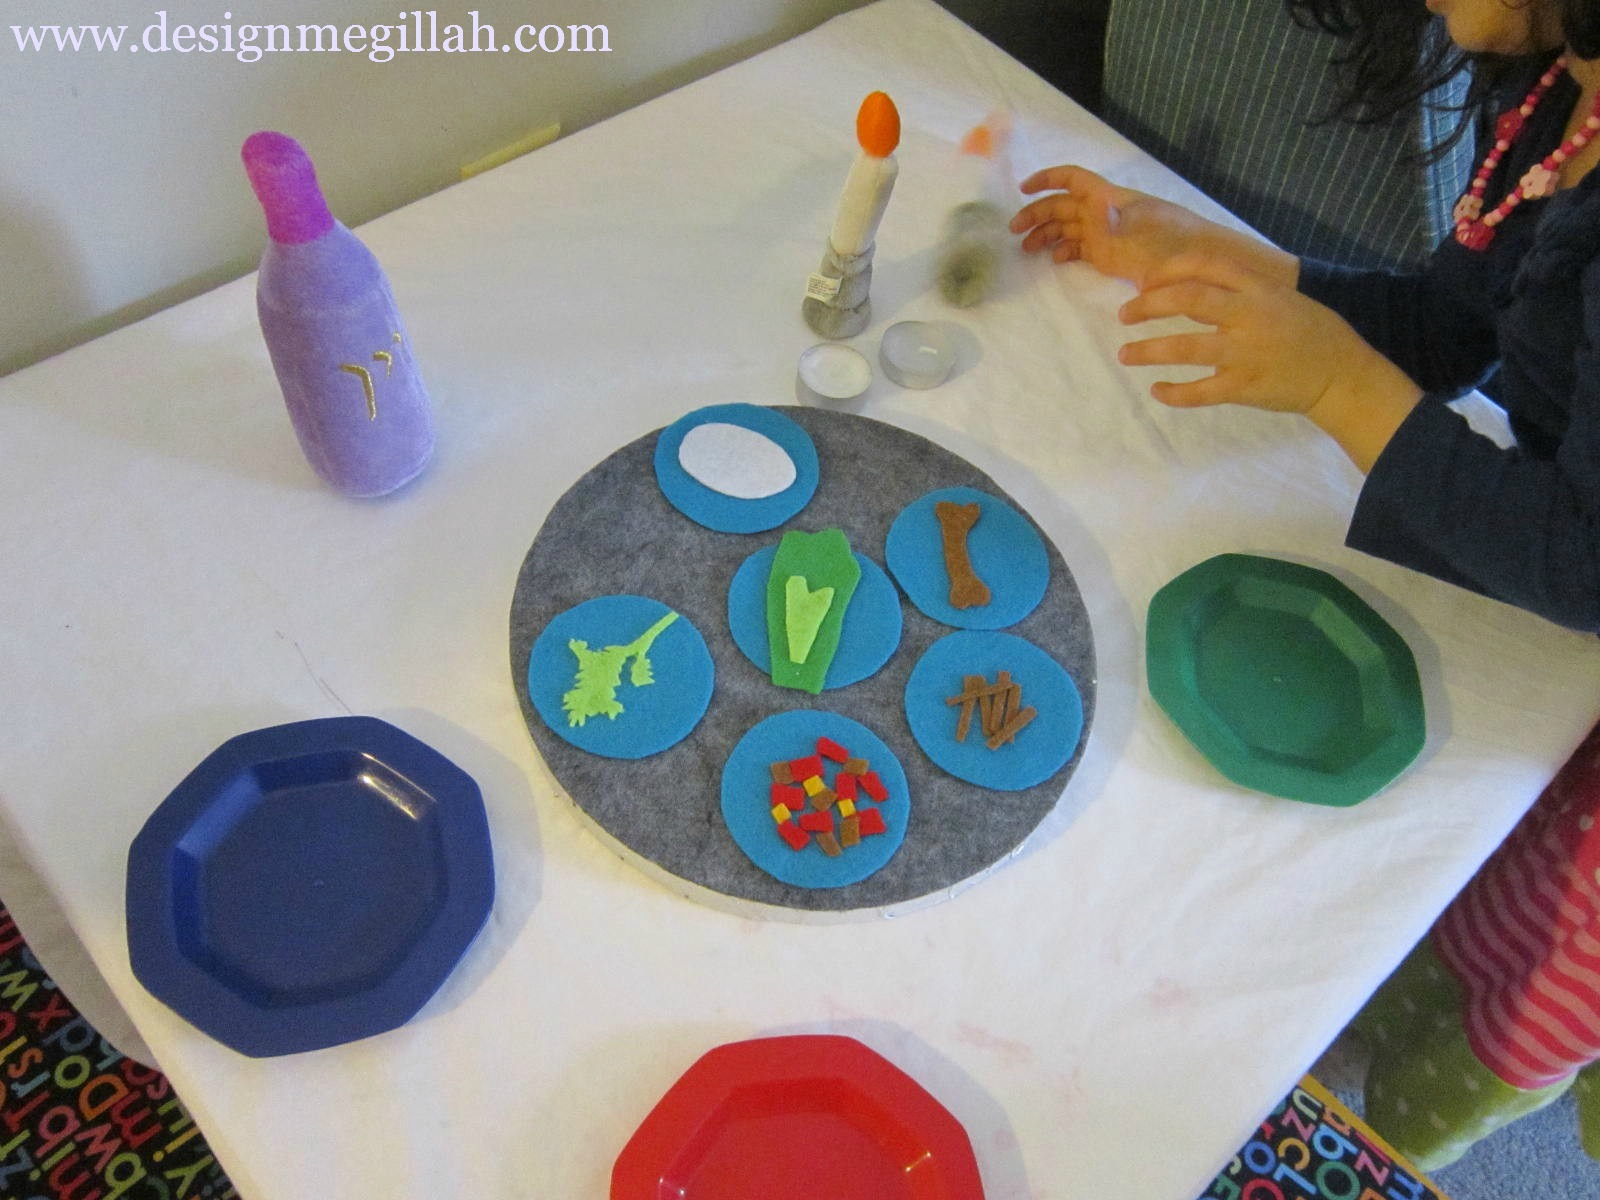 Design Megillah A Felt Seder Plate For Kids